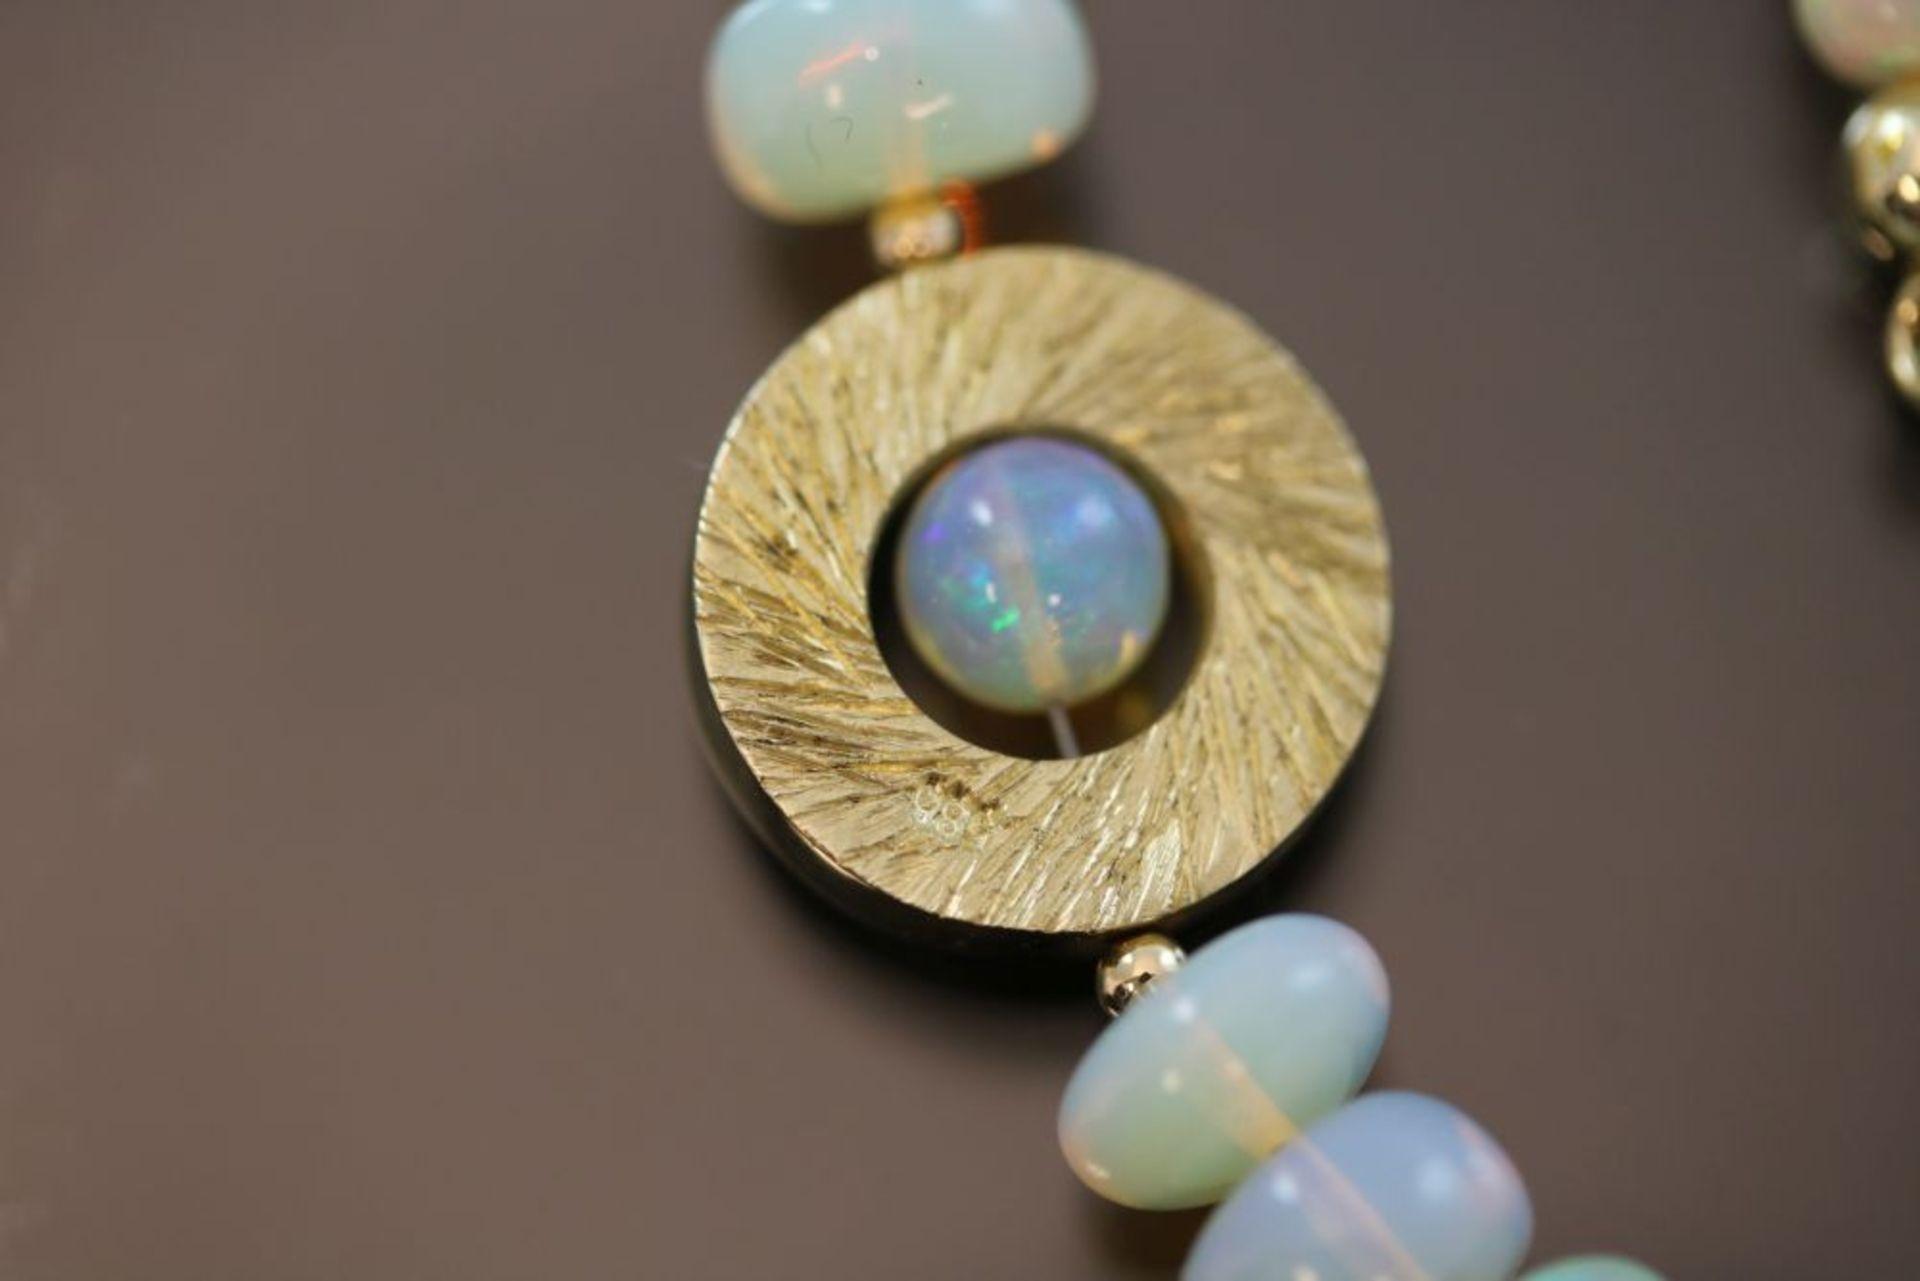 Opal-Collier, 585 Gold - Bild 3 aus 3